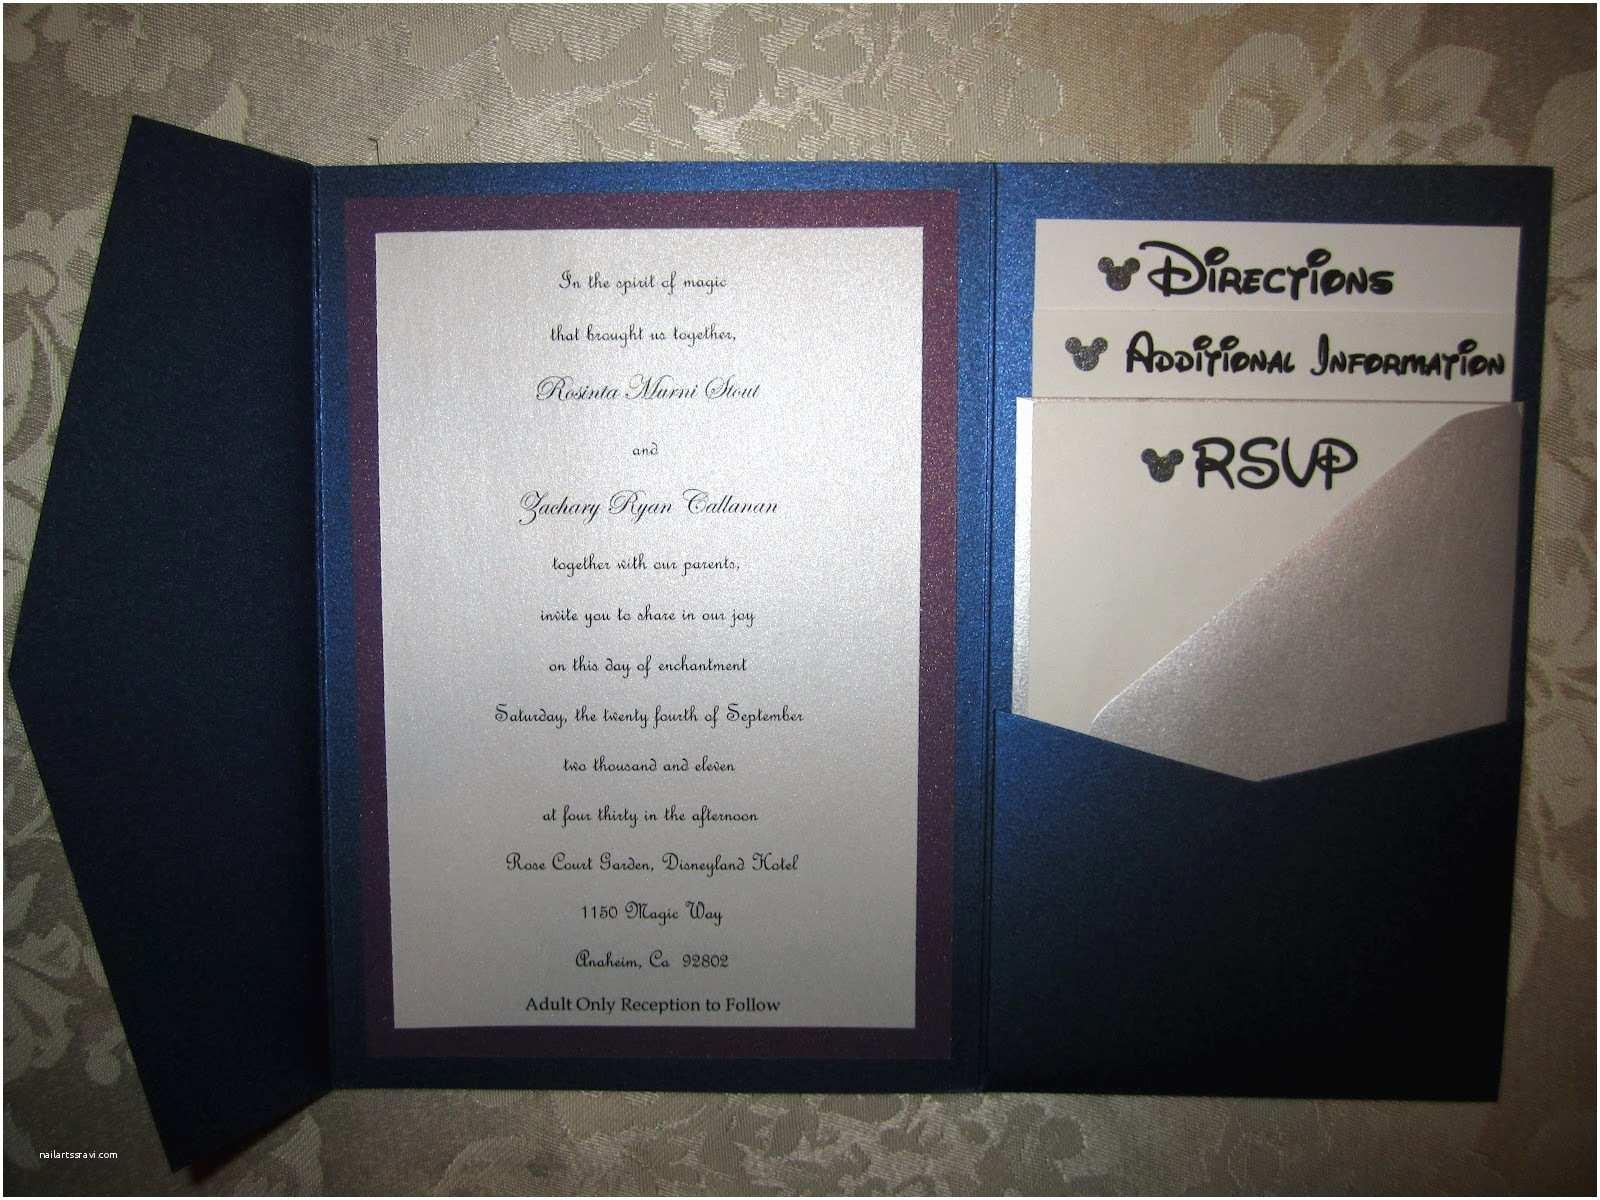 Disney Themed Wedding Invitations Mickey Inspired Details At A Disneyland Wedding